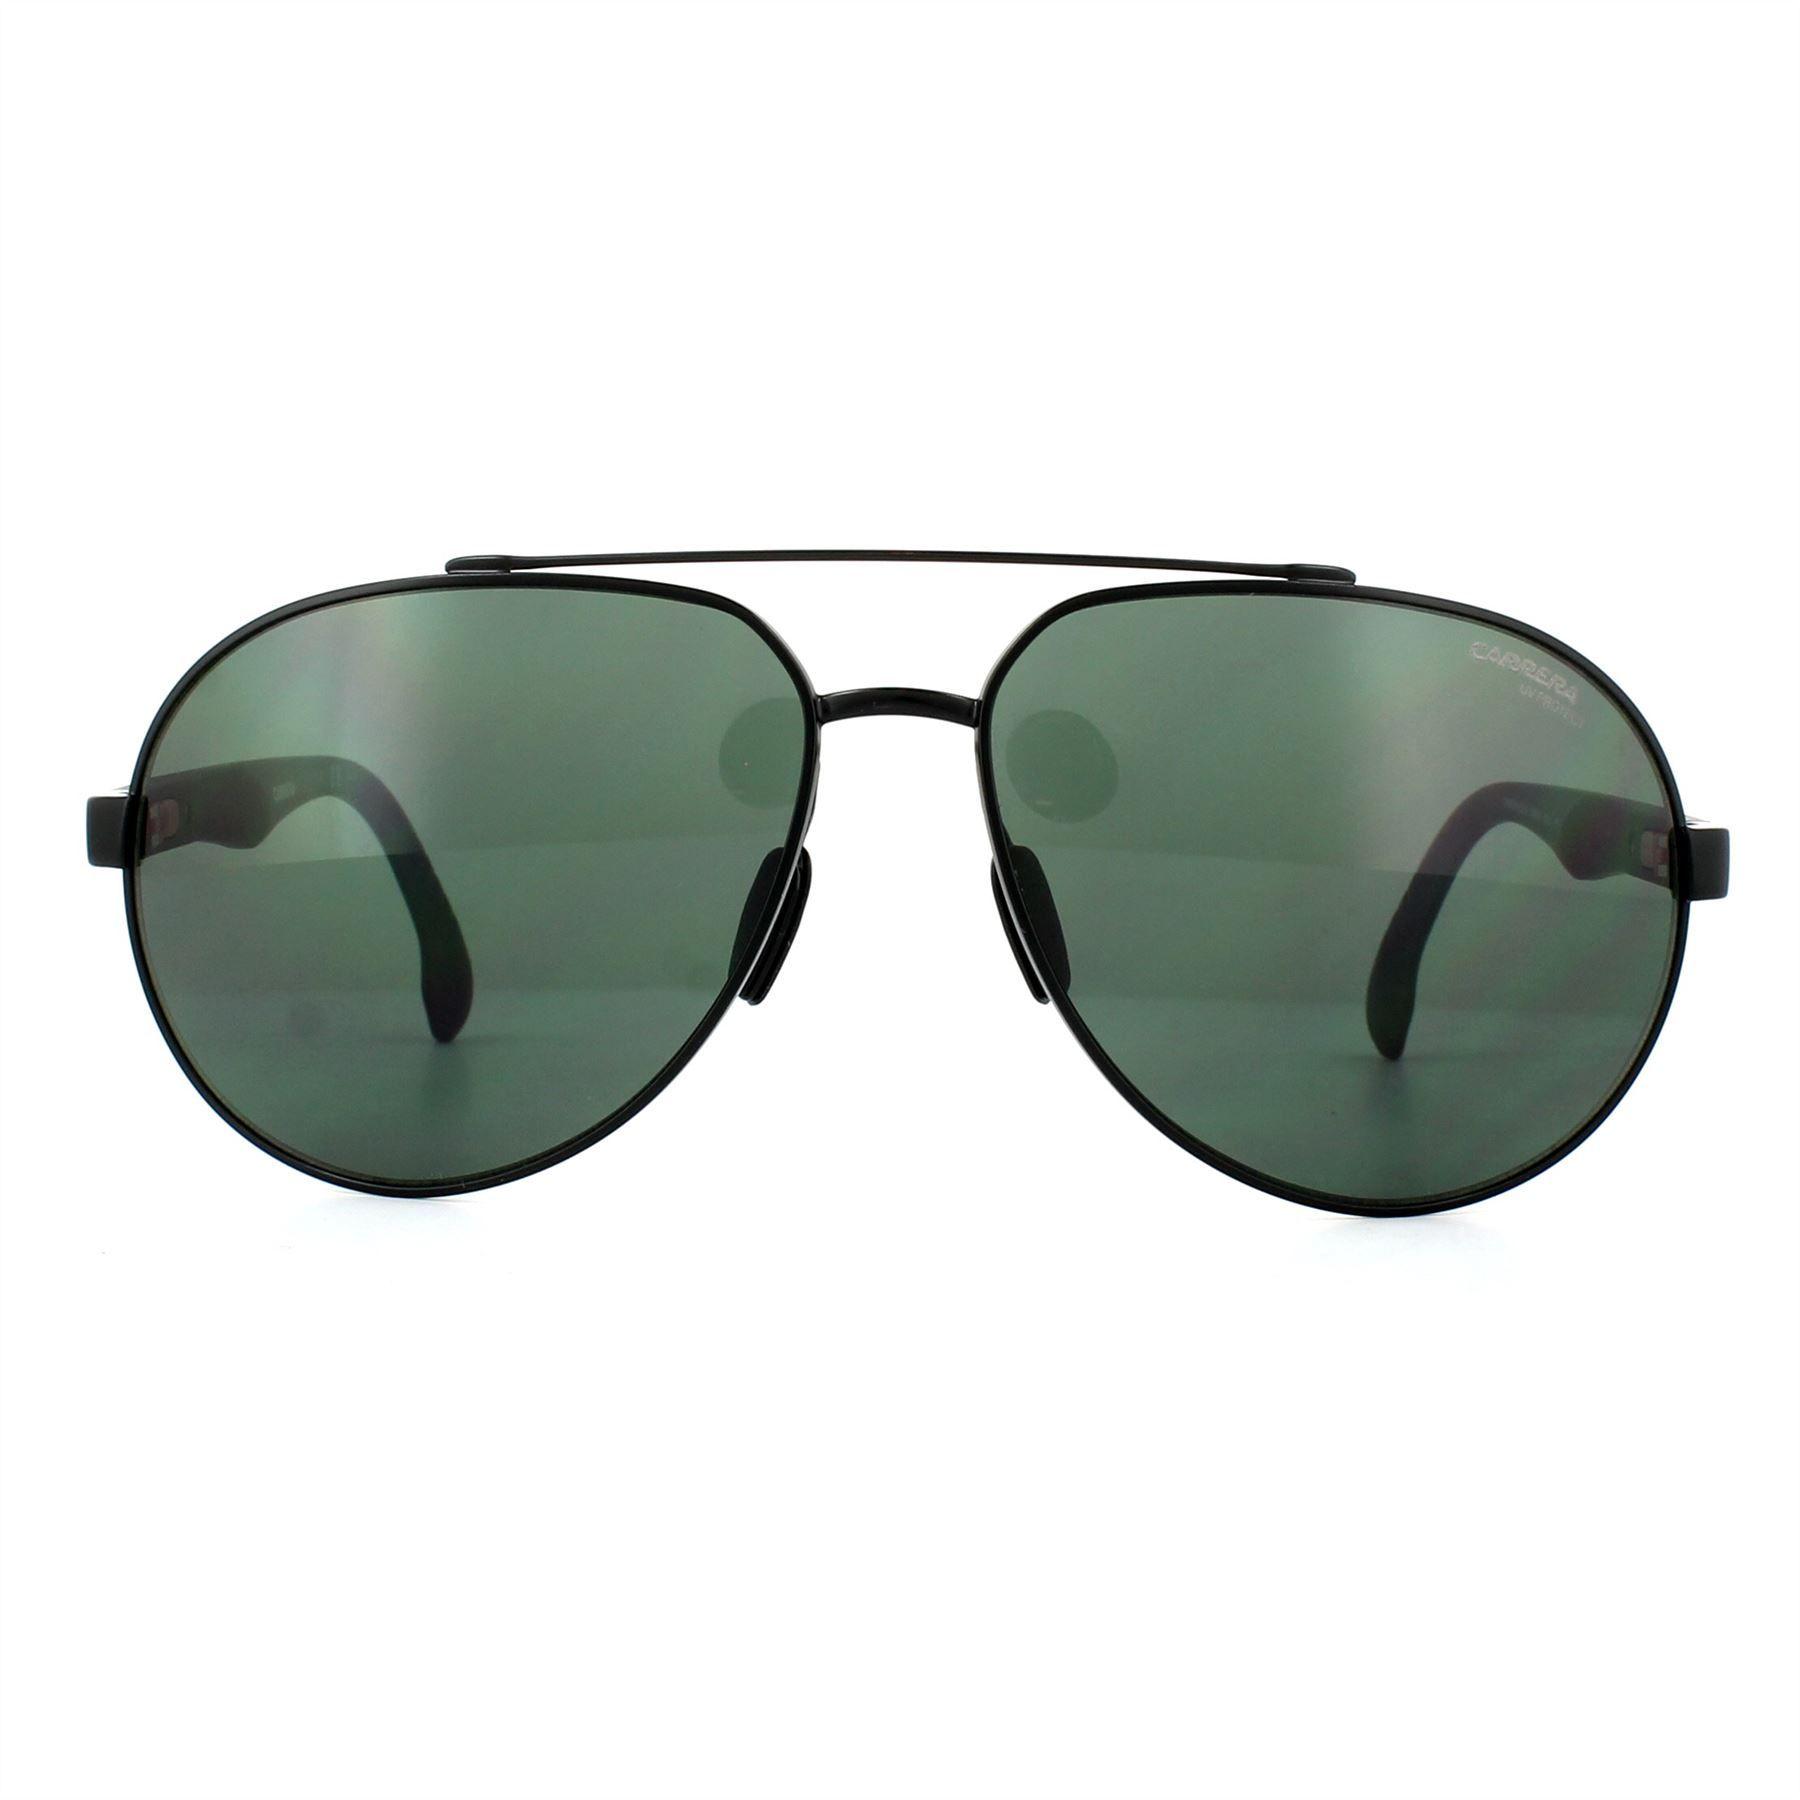 Carrera Sunglasses 8025/S O6W QT Black Green